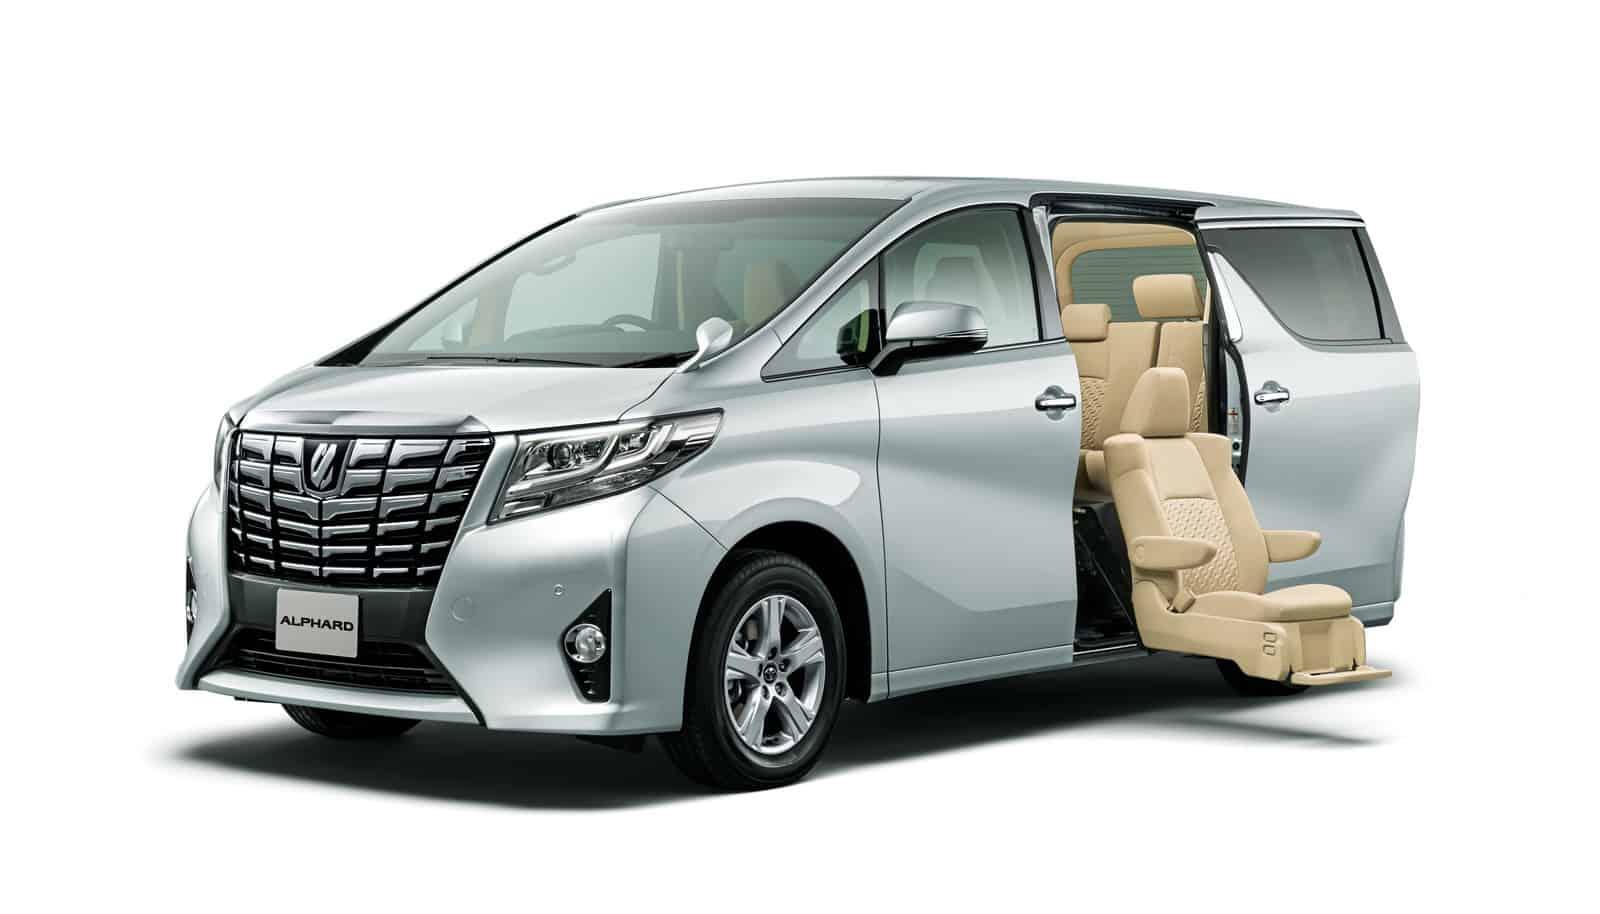 Toyota Alphard And Vellfire Minivan America Is Not Ready